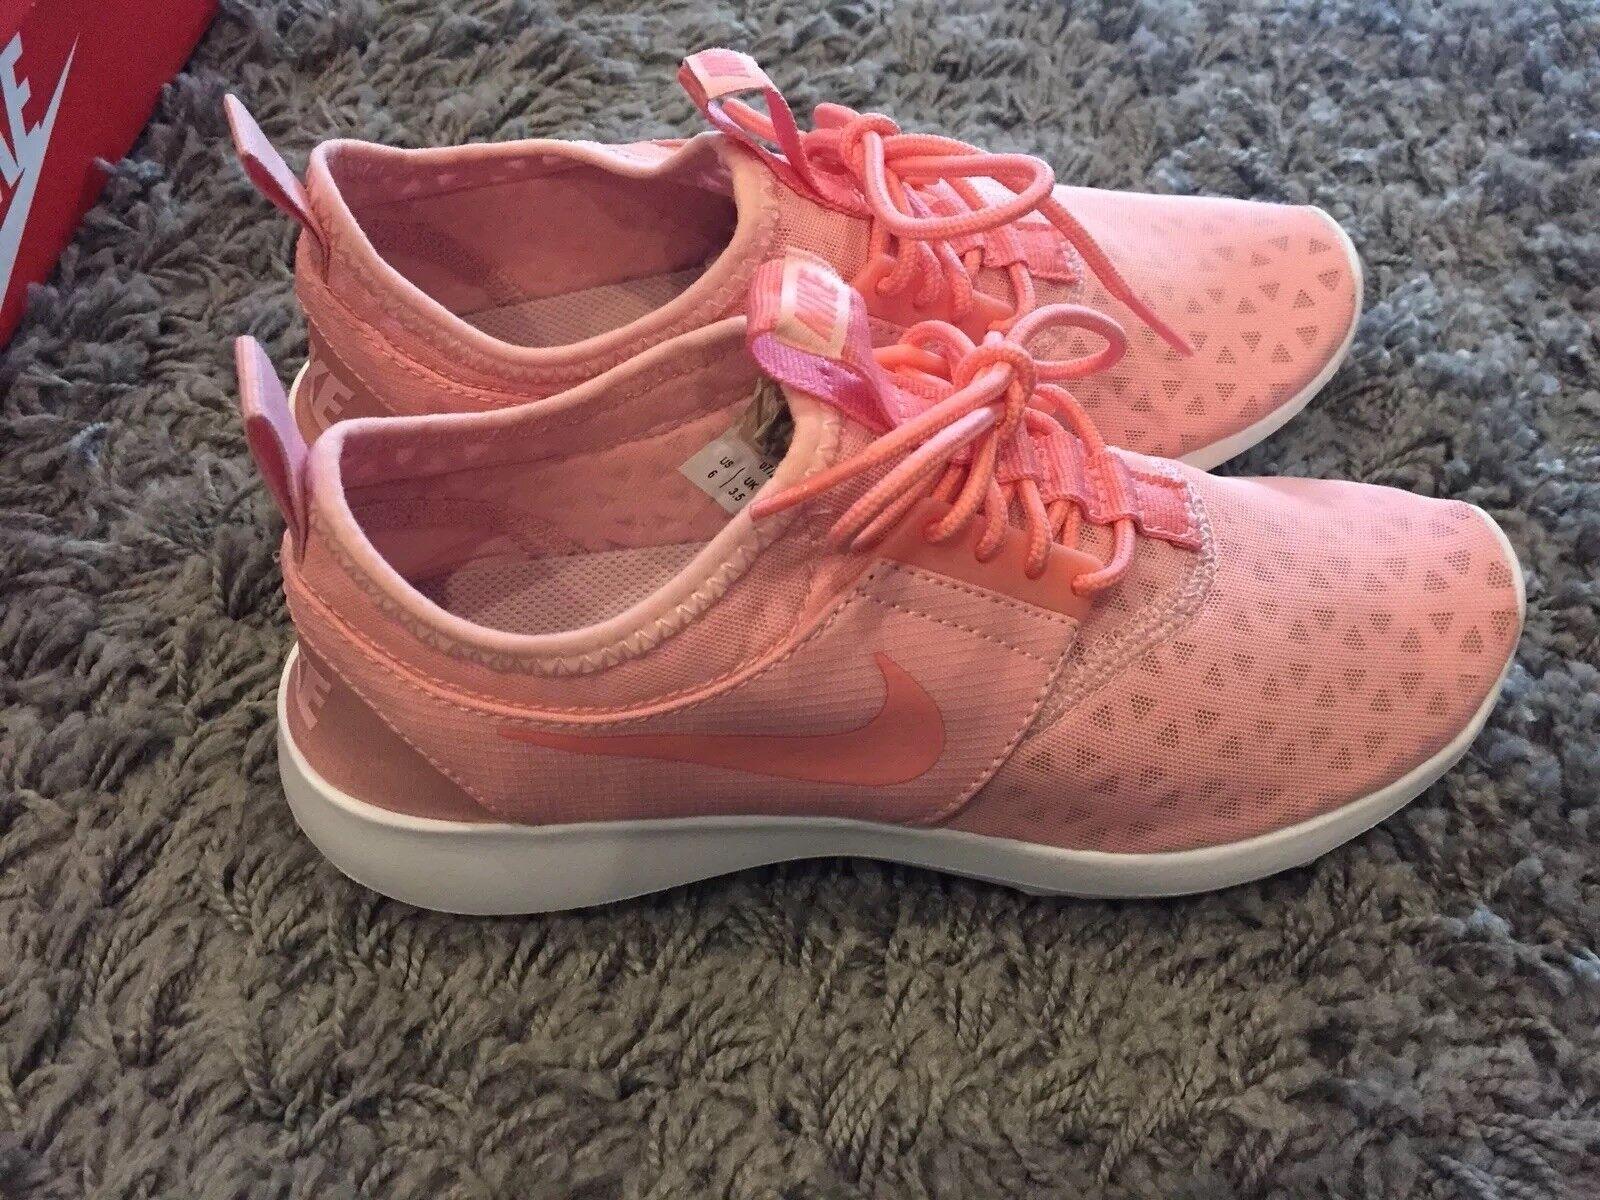 Nike Juvenante damen 36.5 Rosa Neu Neu Neu 068f10